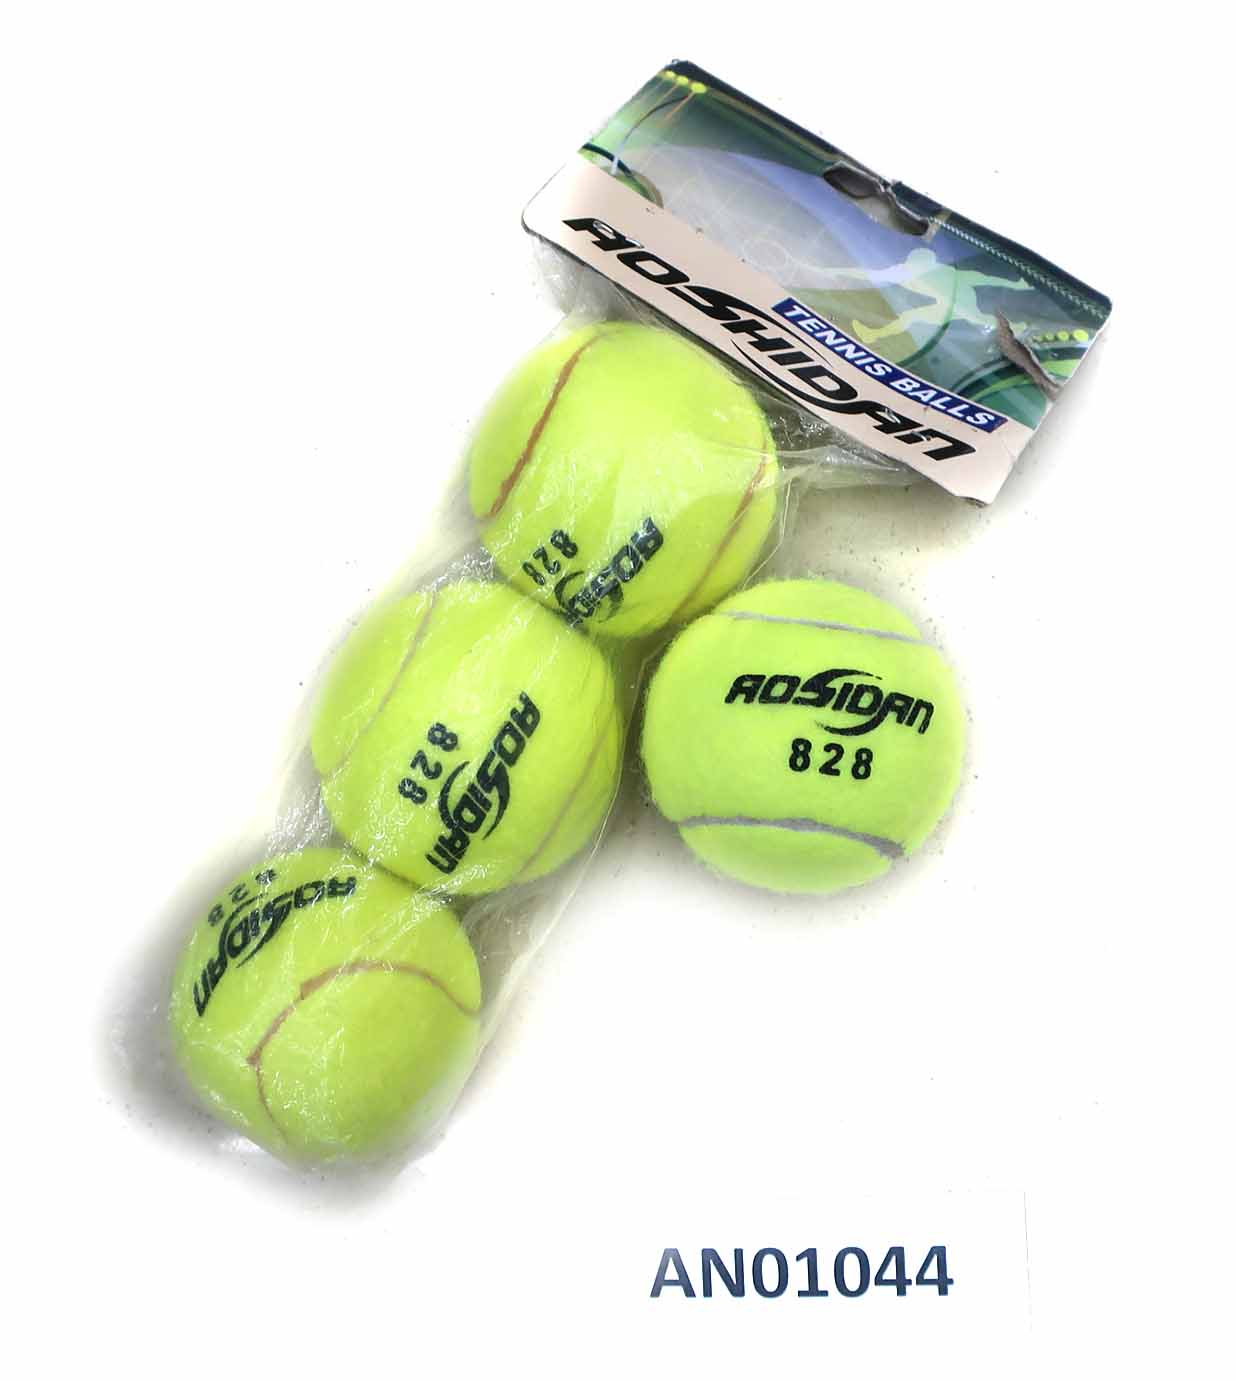 Теннисный мяч в пакете Арт. AN01044